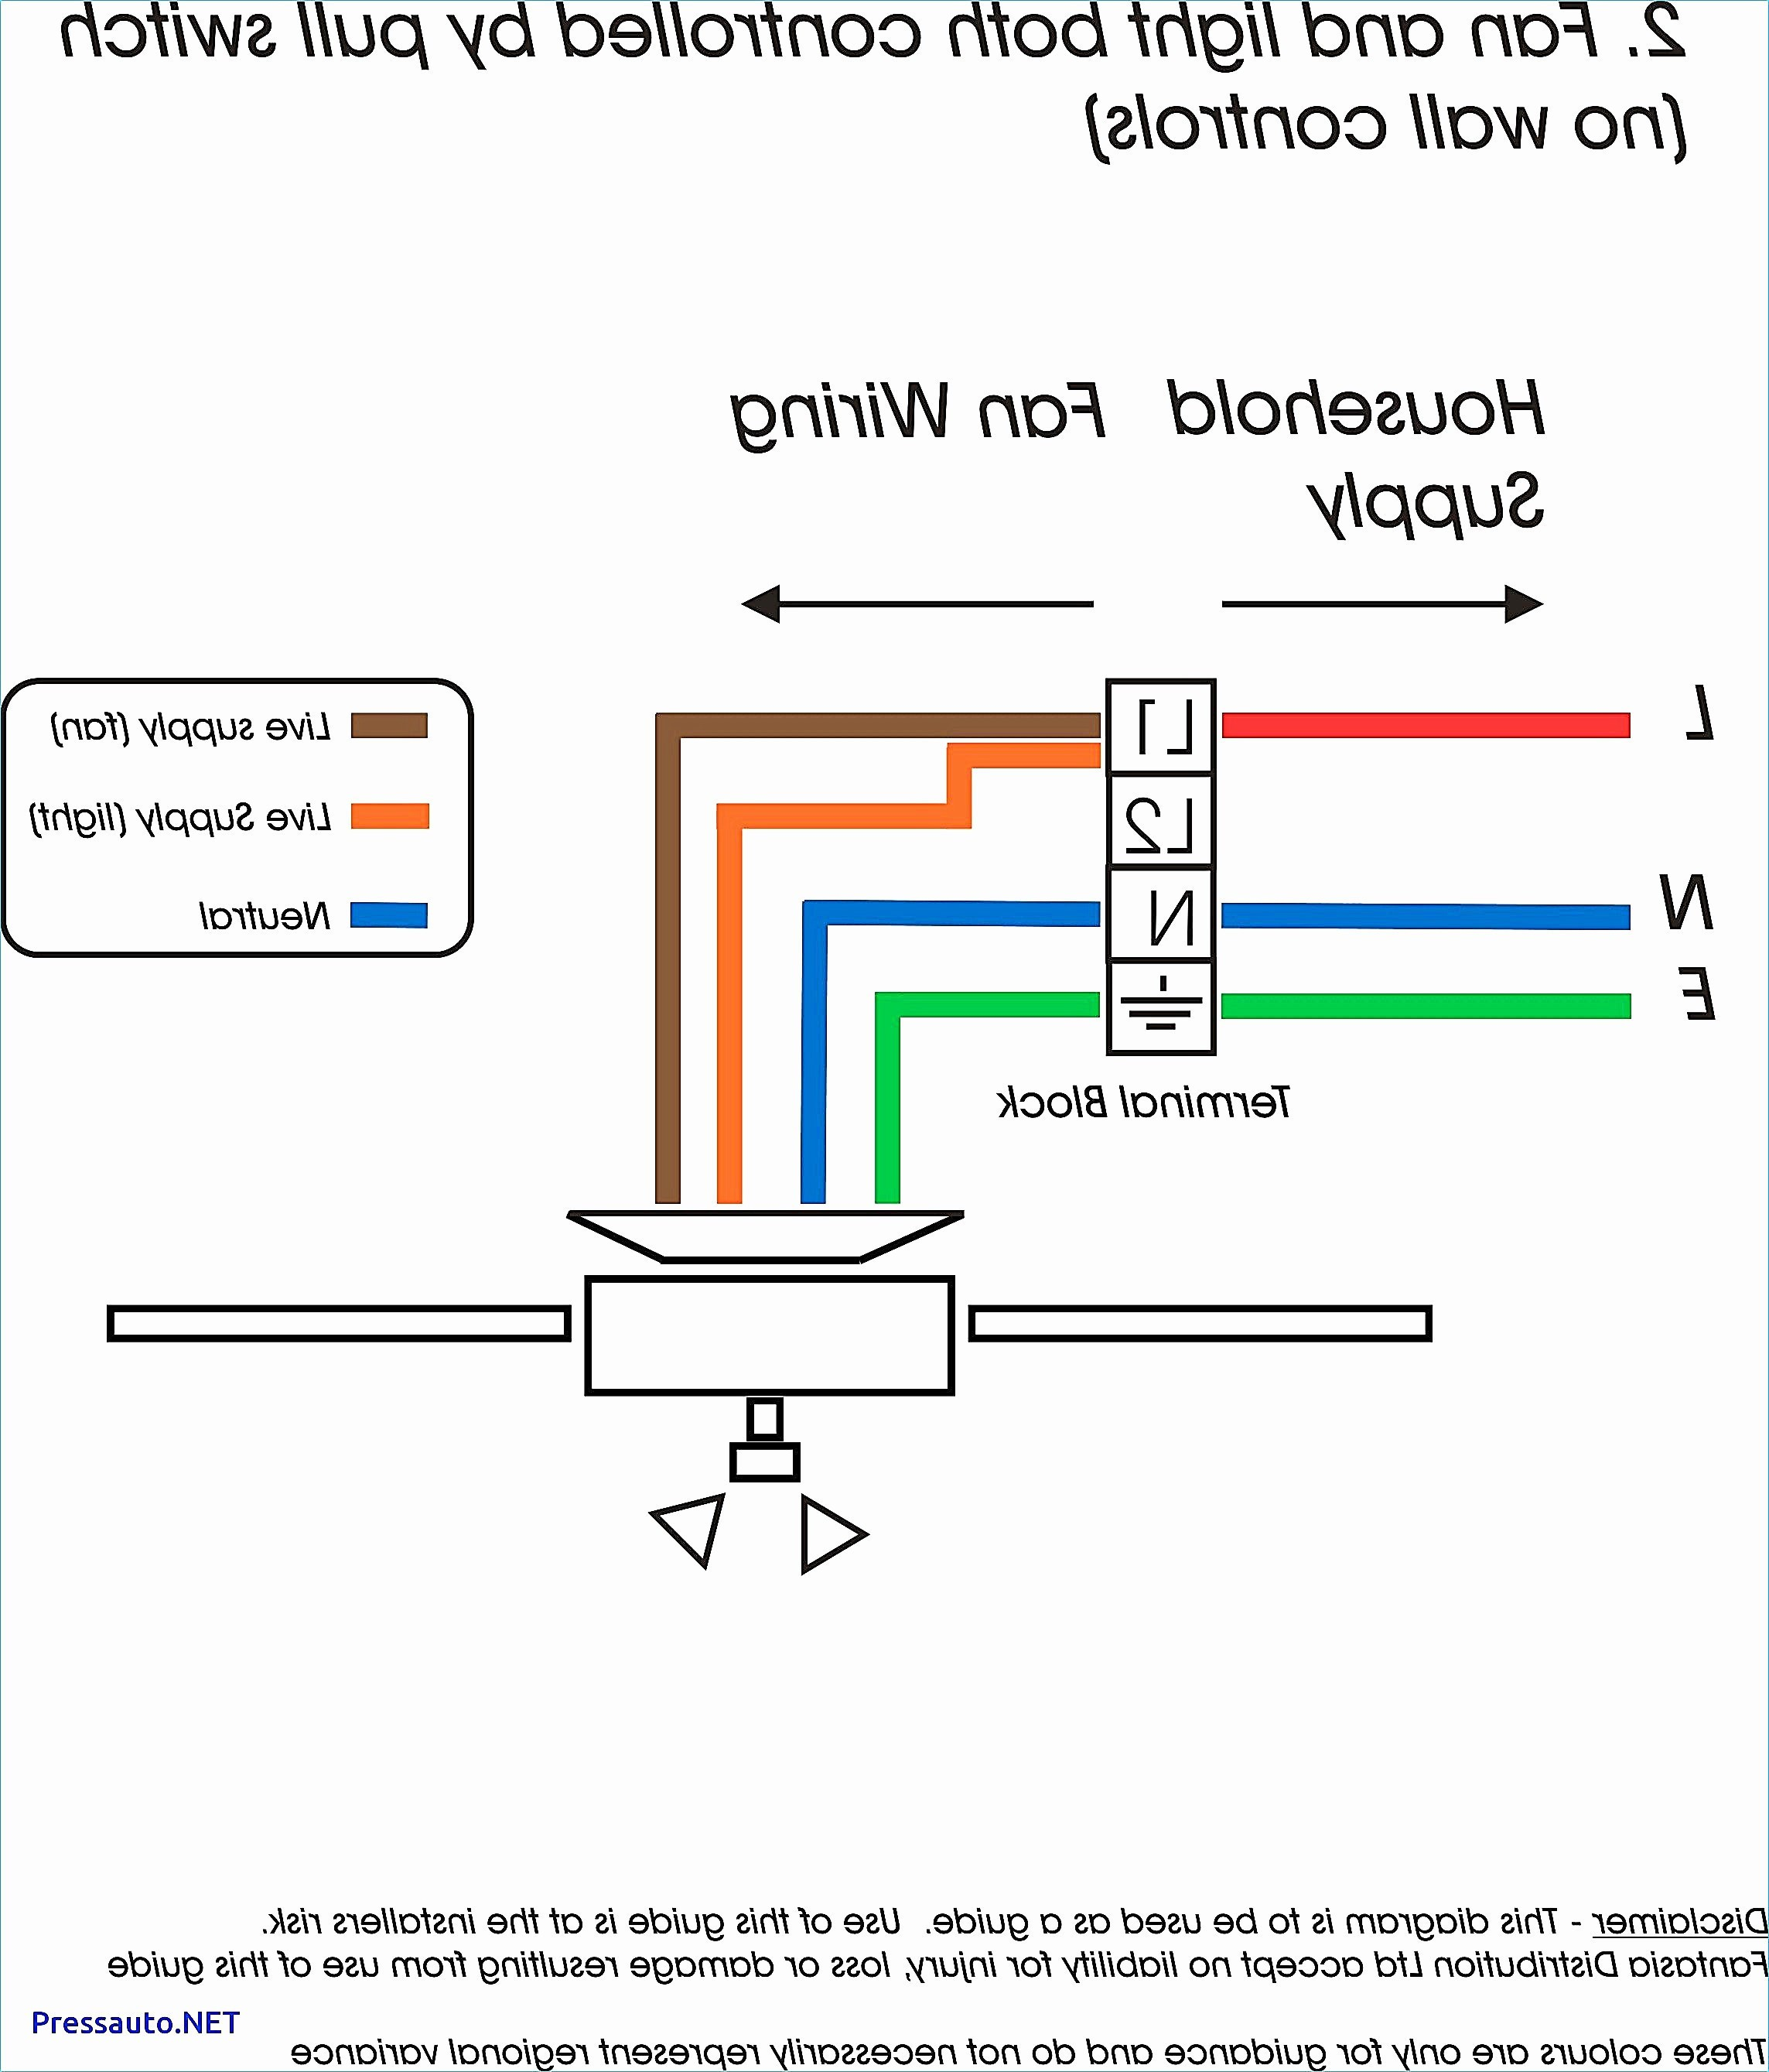 Smoke Detector Wiring Diagram Pdf Electrical Circuit Wiring Diagram on wiring diagram for smoke detectors